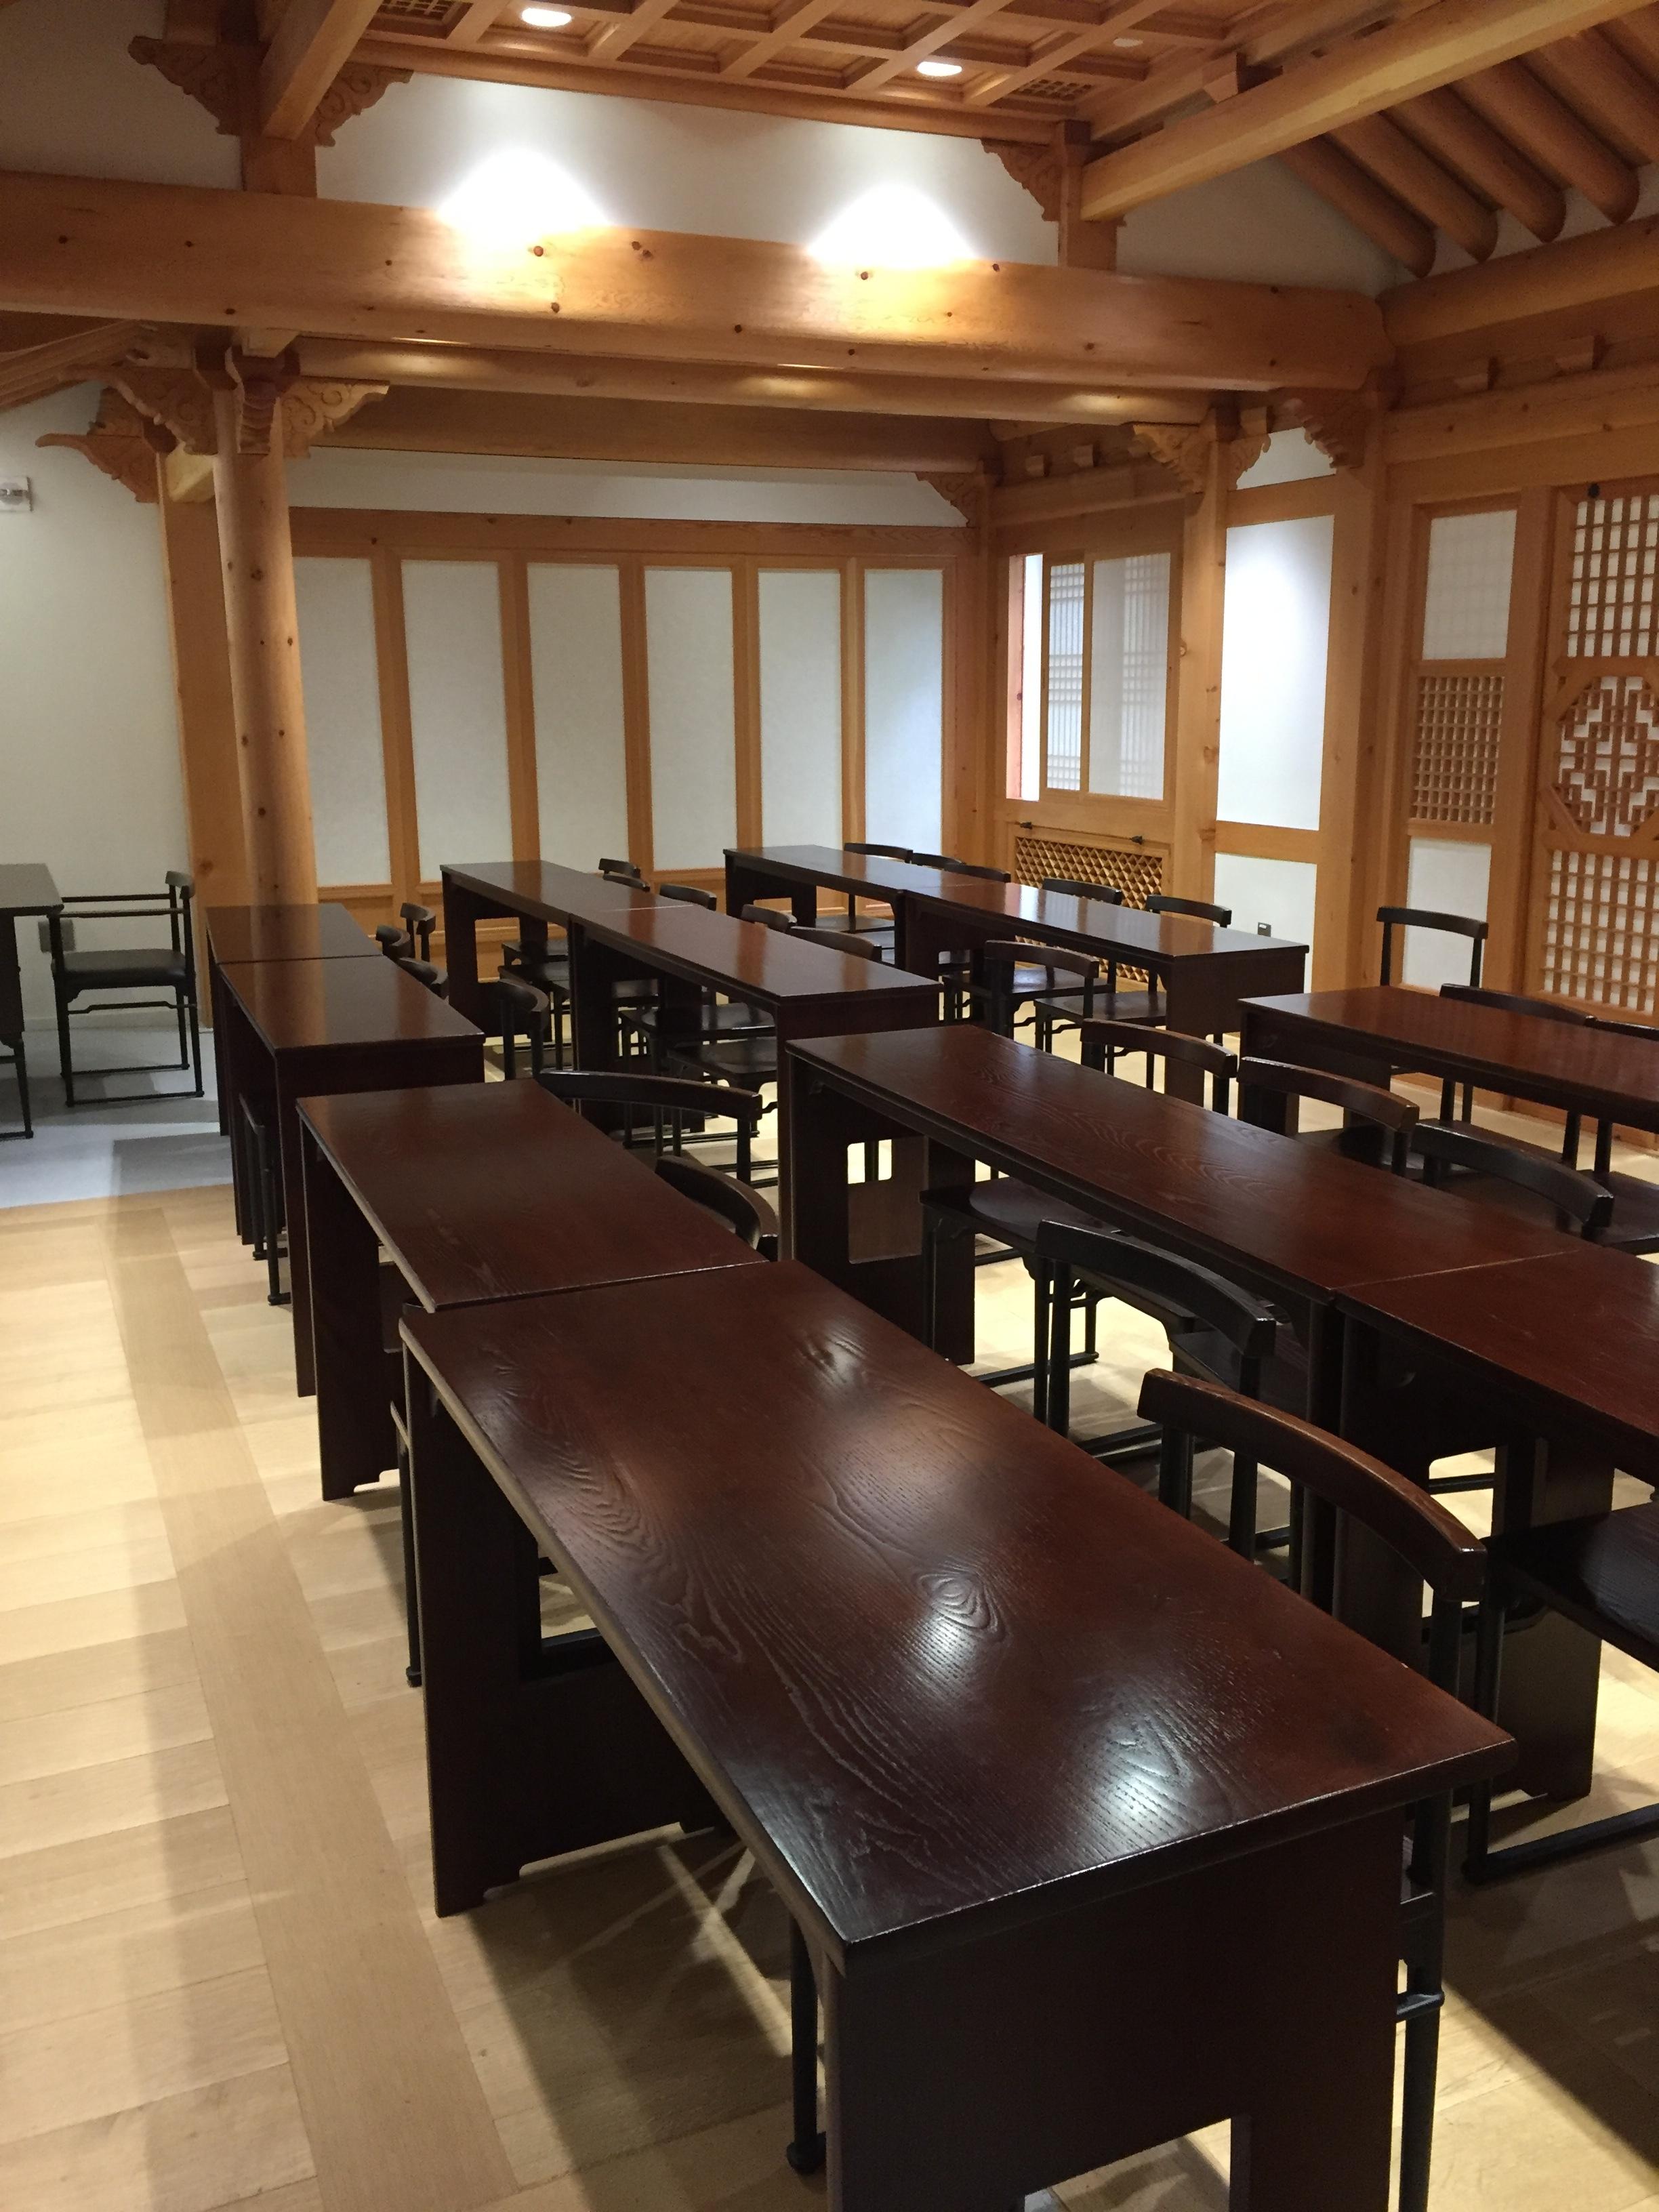 The Korean room